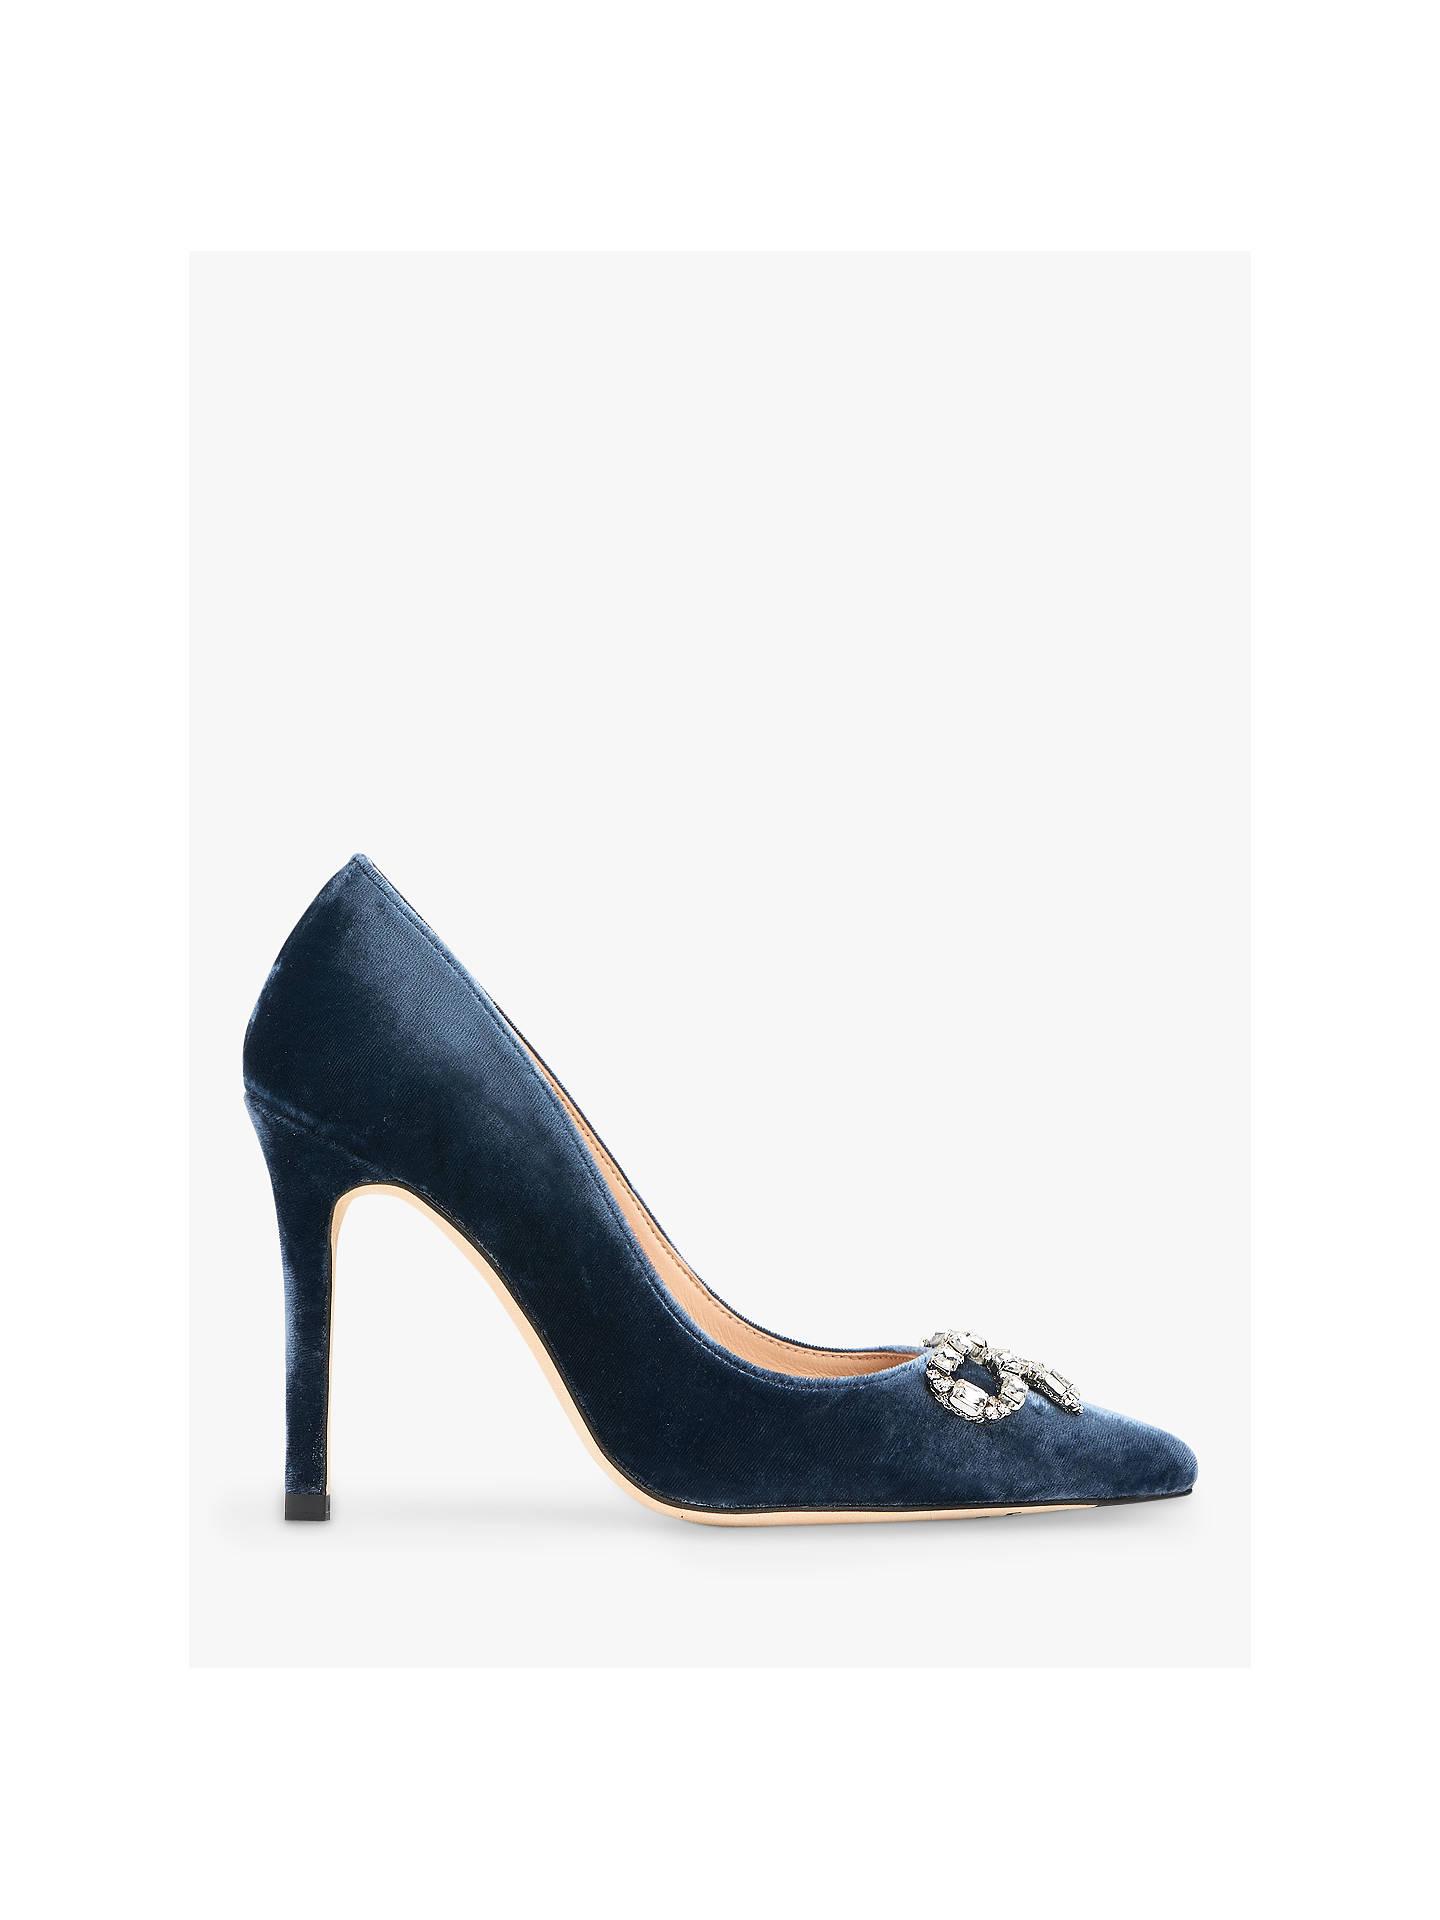 7a865d6b4a2 Buy L.K.Bennett Fern Embellished Bow Court Shoes, Powder Blue, 3 Online at  johnlewis ...